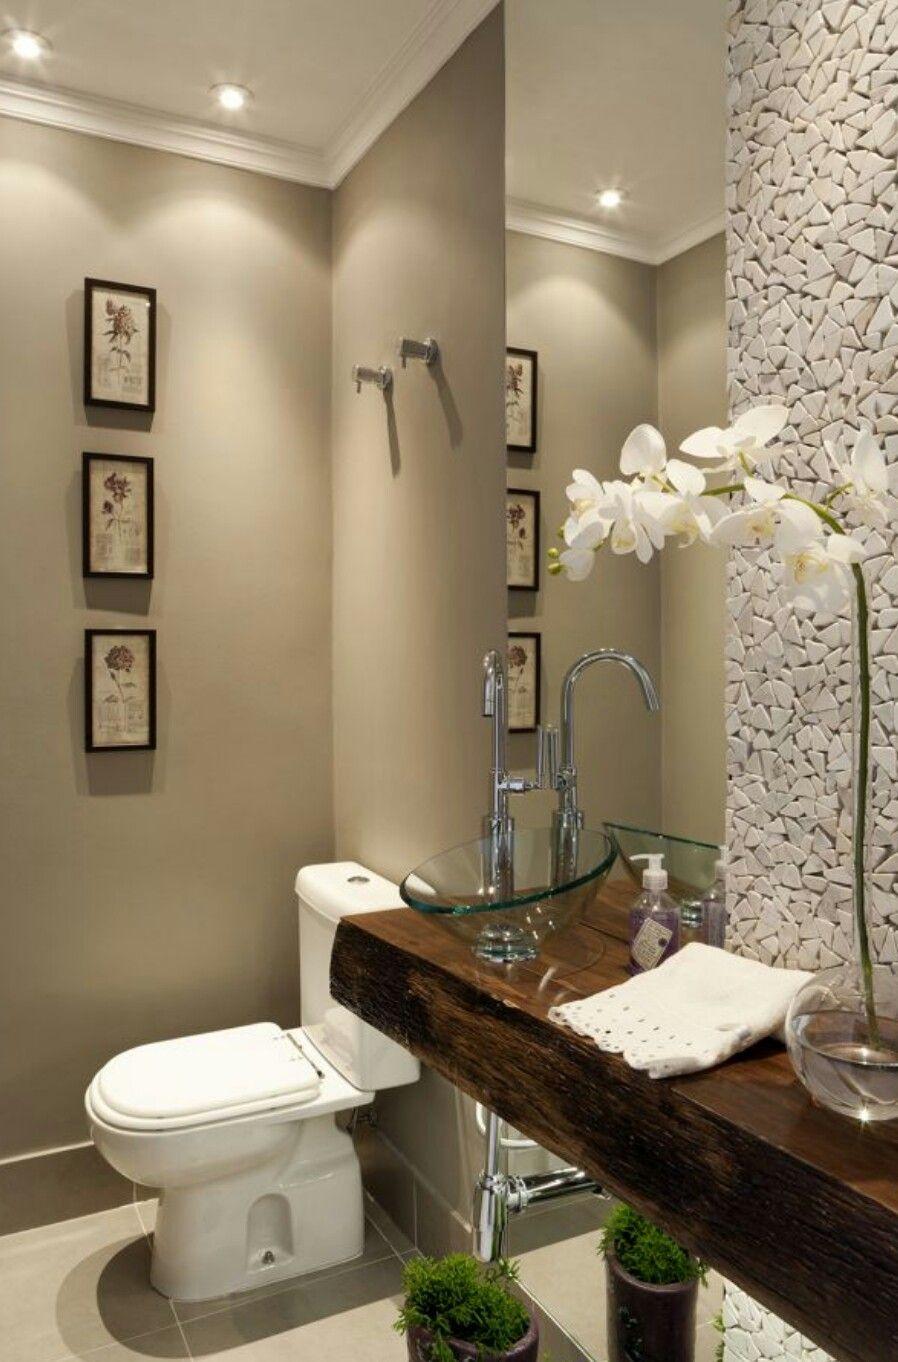 ideas for bathrooms decorating%0A Bathroom Ideas  Bathroom Remodeling  Cozy Bathroom  Bathroom Designs   Minimalist Bathroom  Decorating Ideas  Decorate Your Home  Ideas Ba  os   Ideas Para